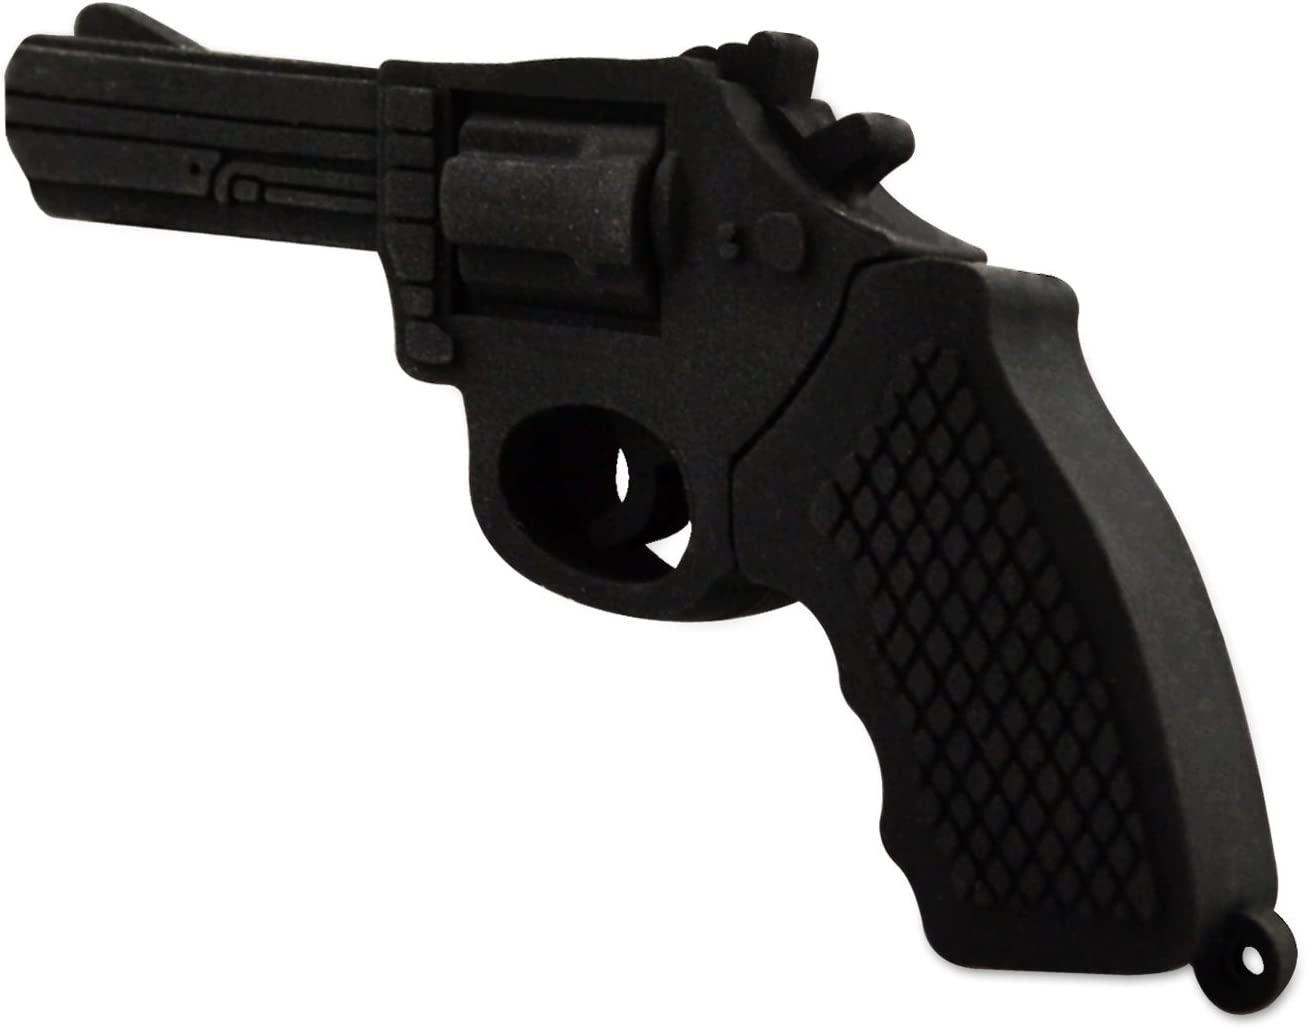 818-Tech No1320009 Hi-Speed USB-Sticks (2/4/8/16/32/64 GB) pistola ...